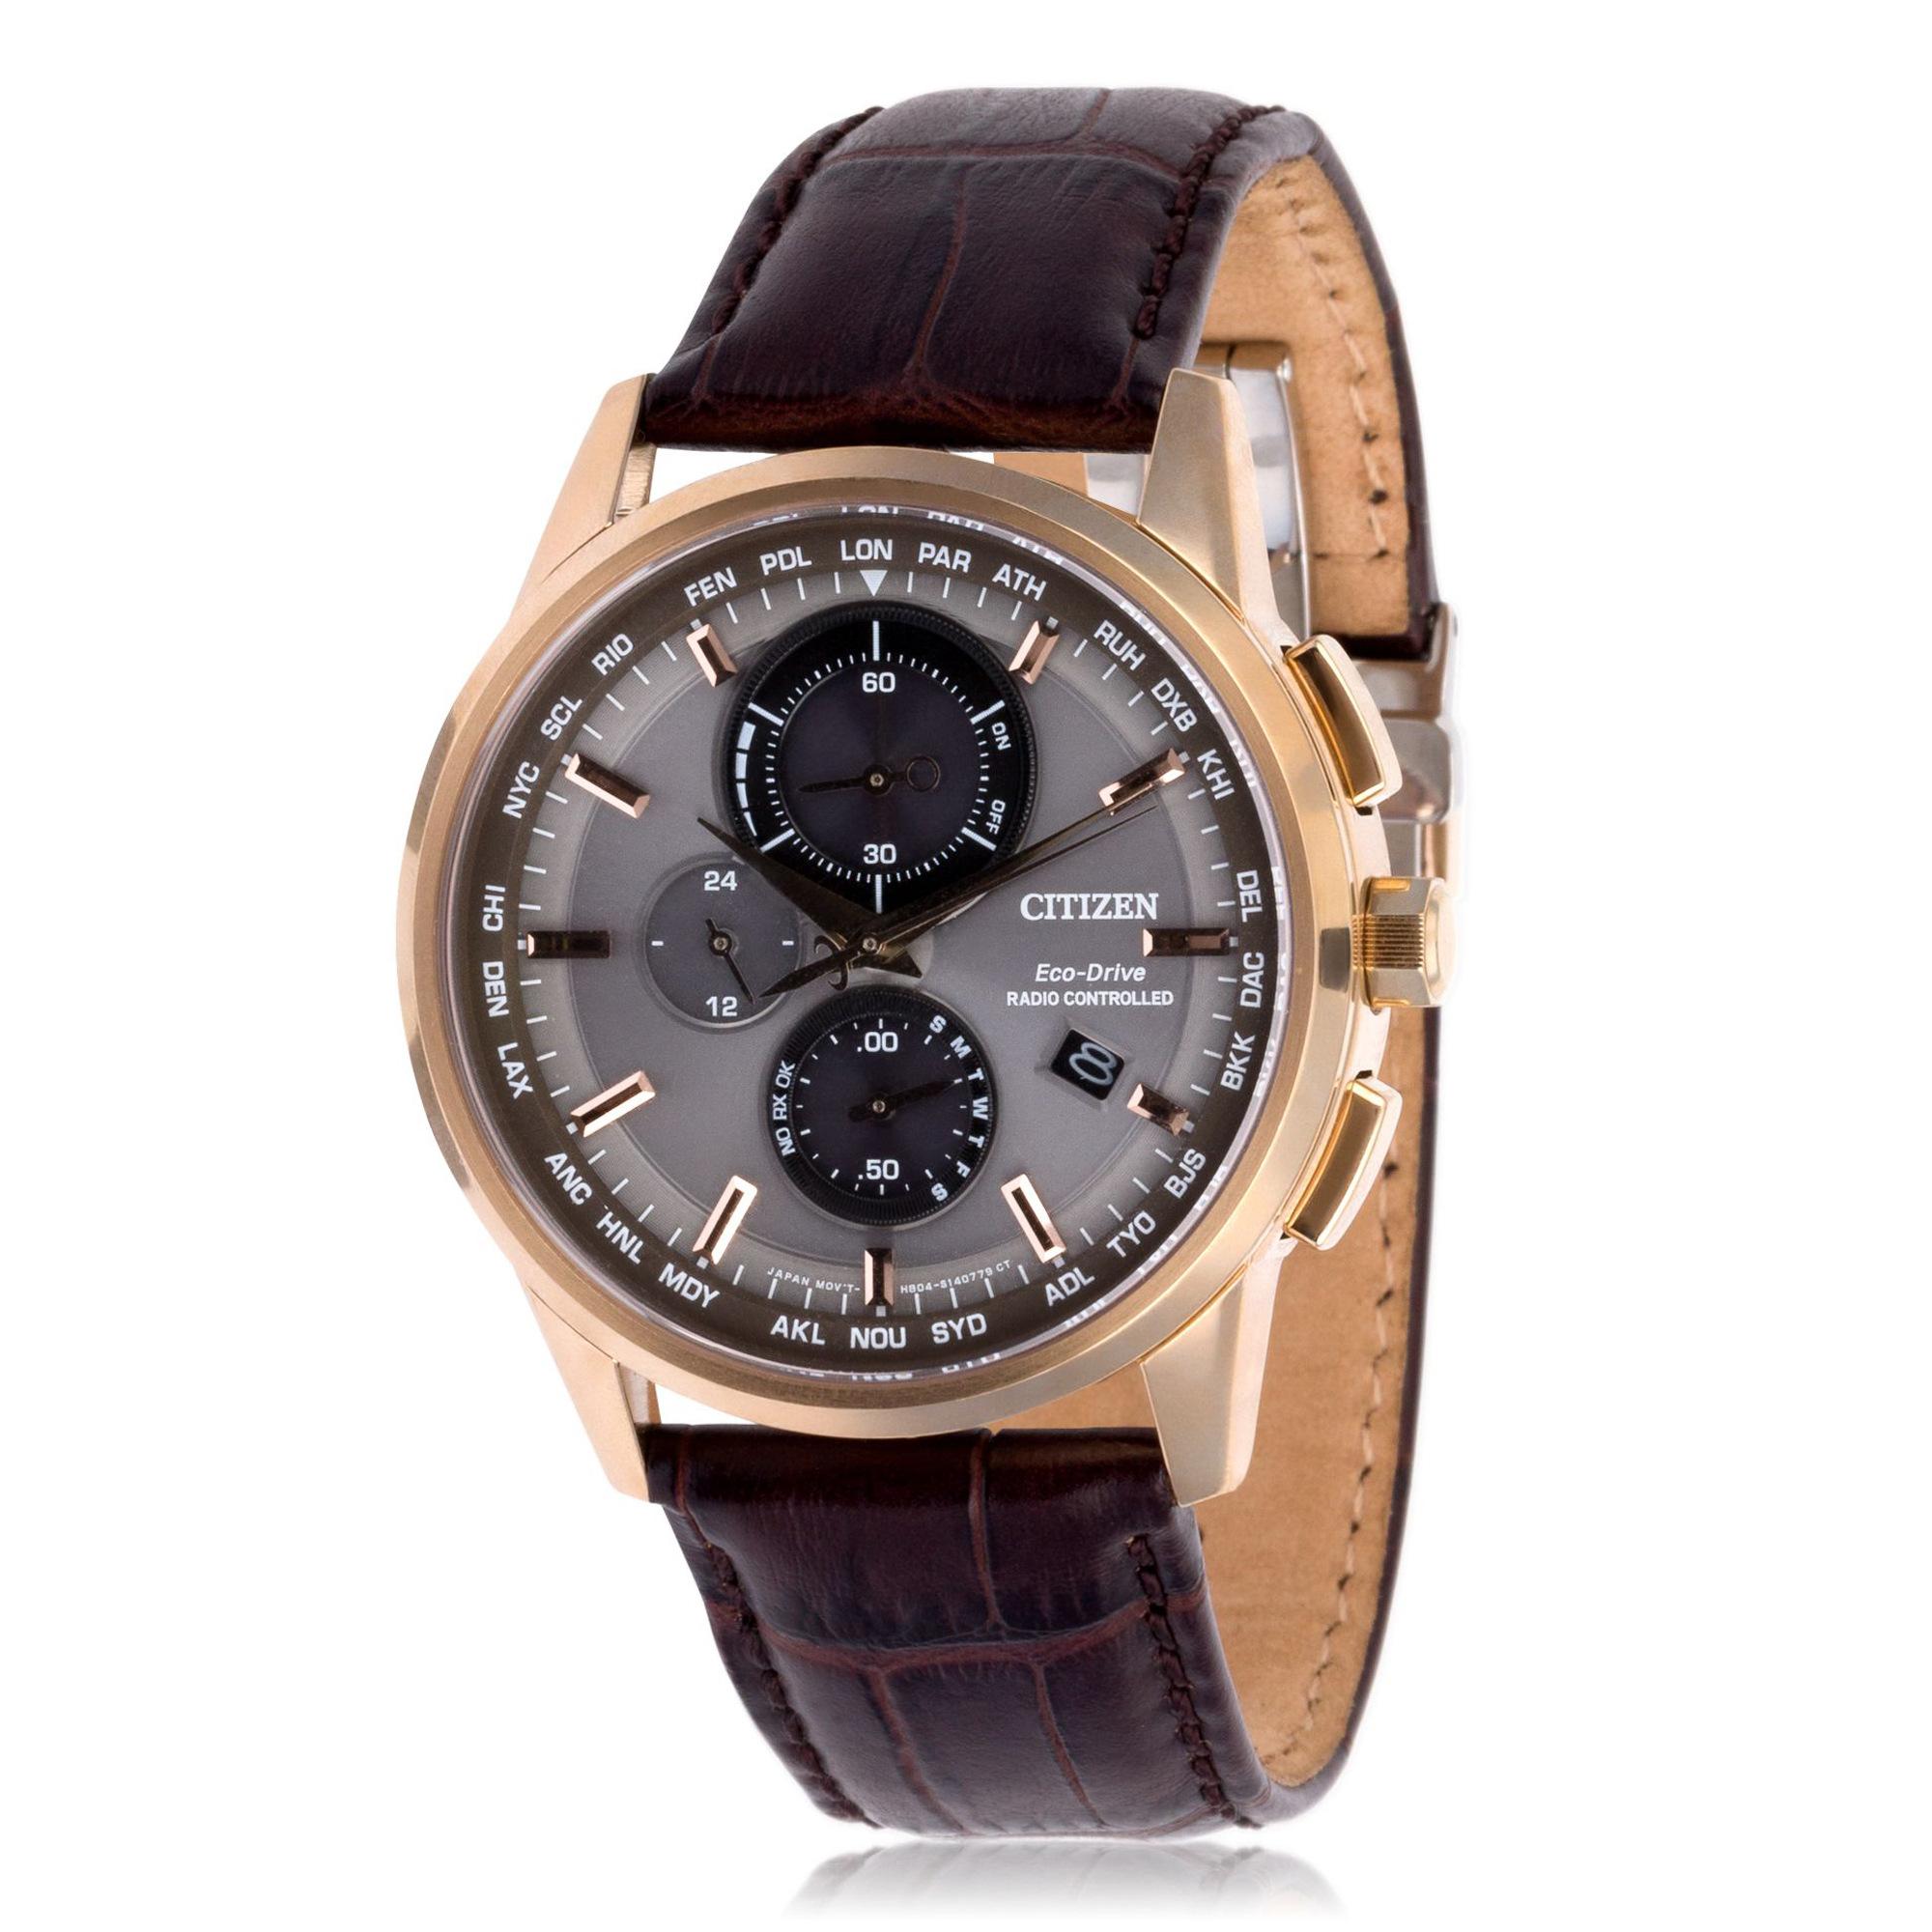 Reloj cronógrafo Eco Drive H804 Radiocontrolado - piel marrón - Ø: 43 mm